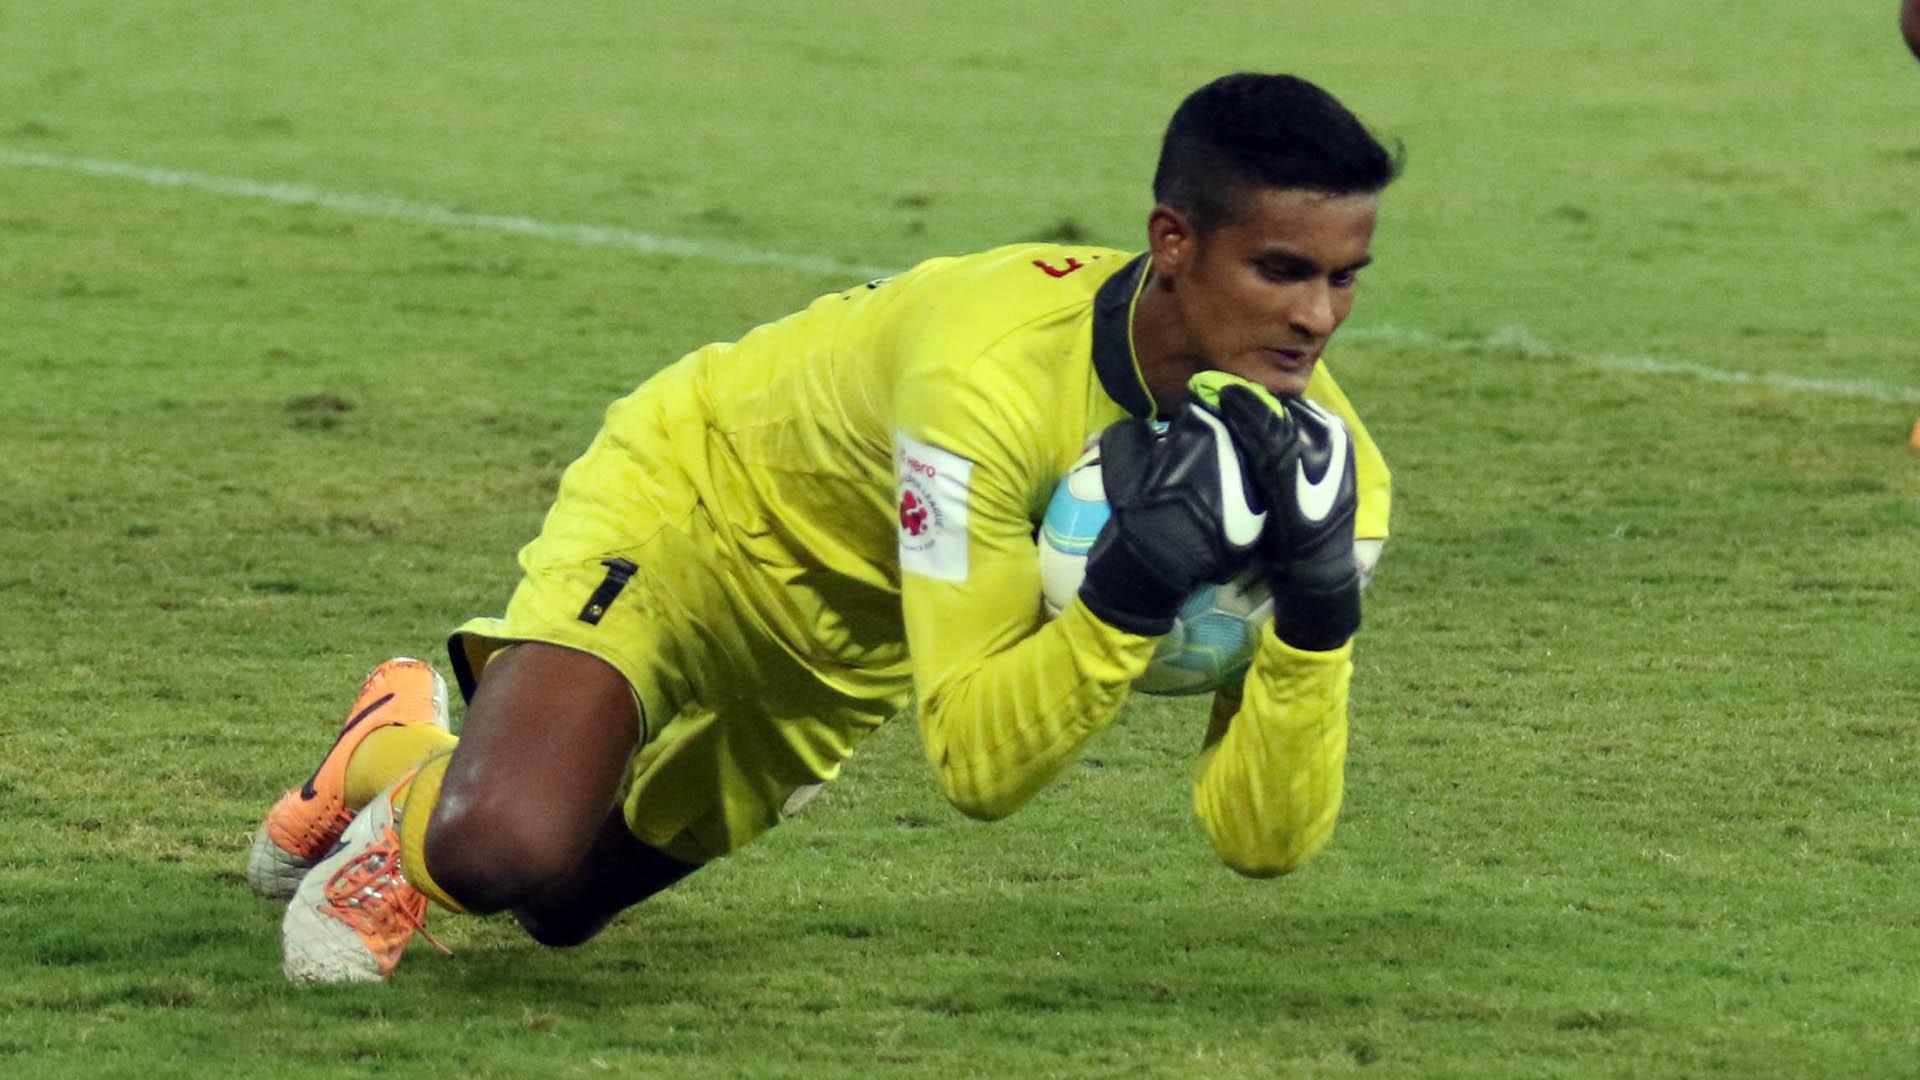 Subrata Paul Chennaiyin FC NorthEast United FC ISL season 3 2016